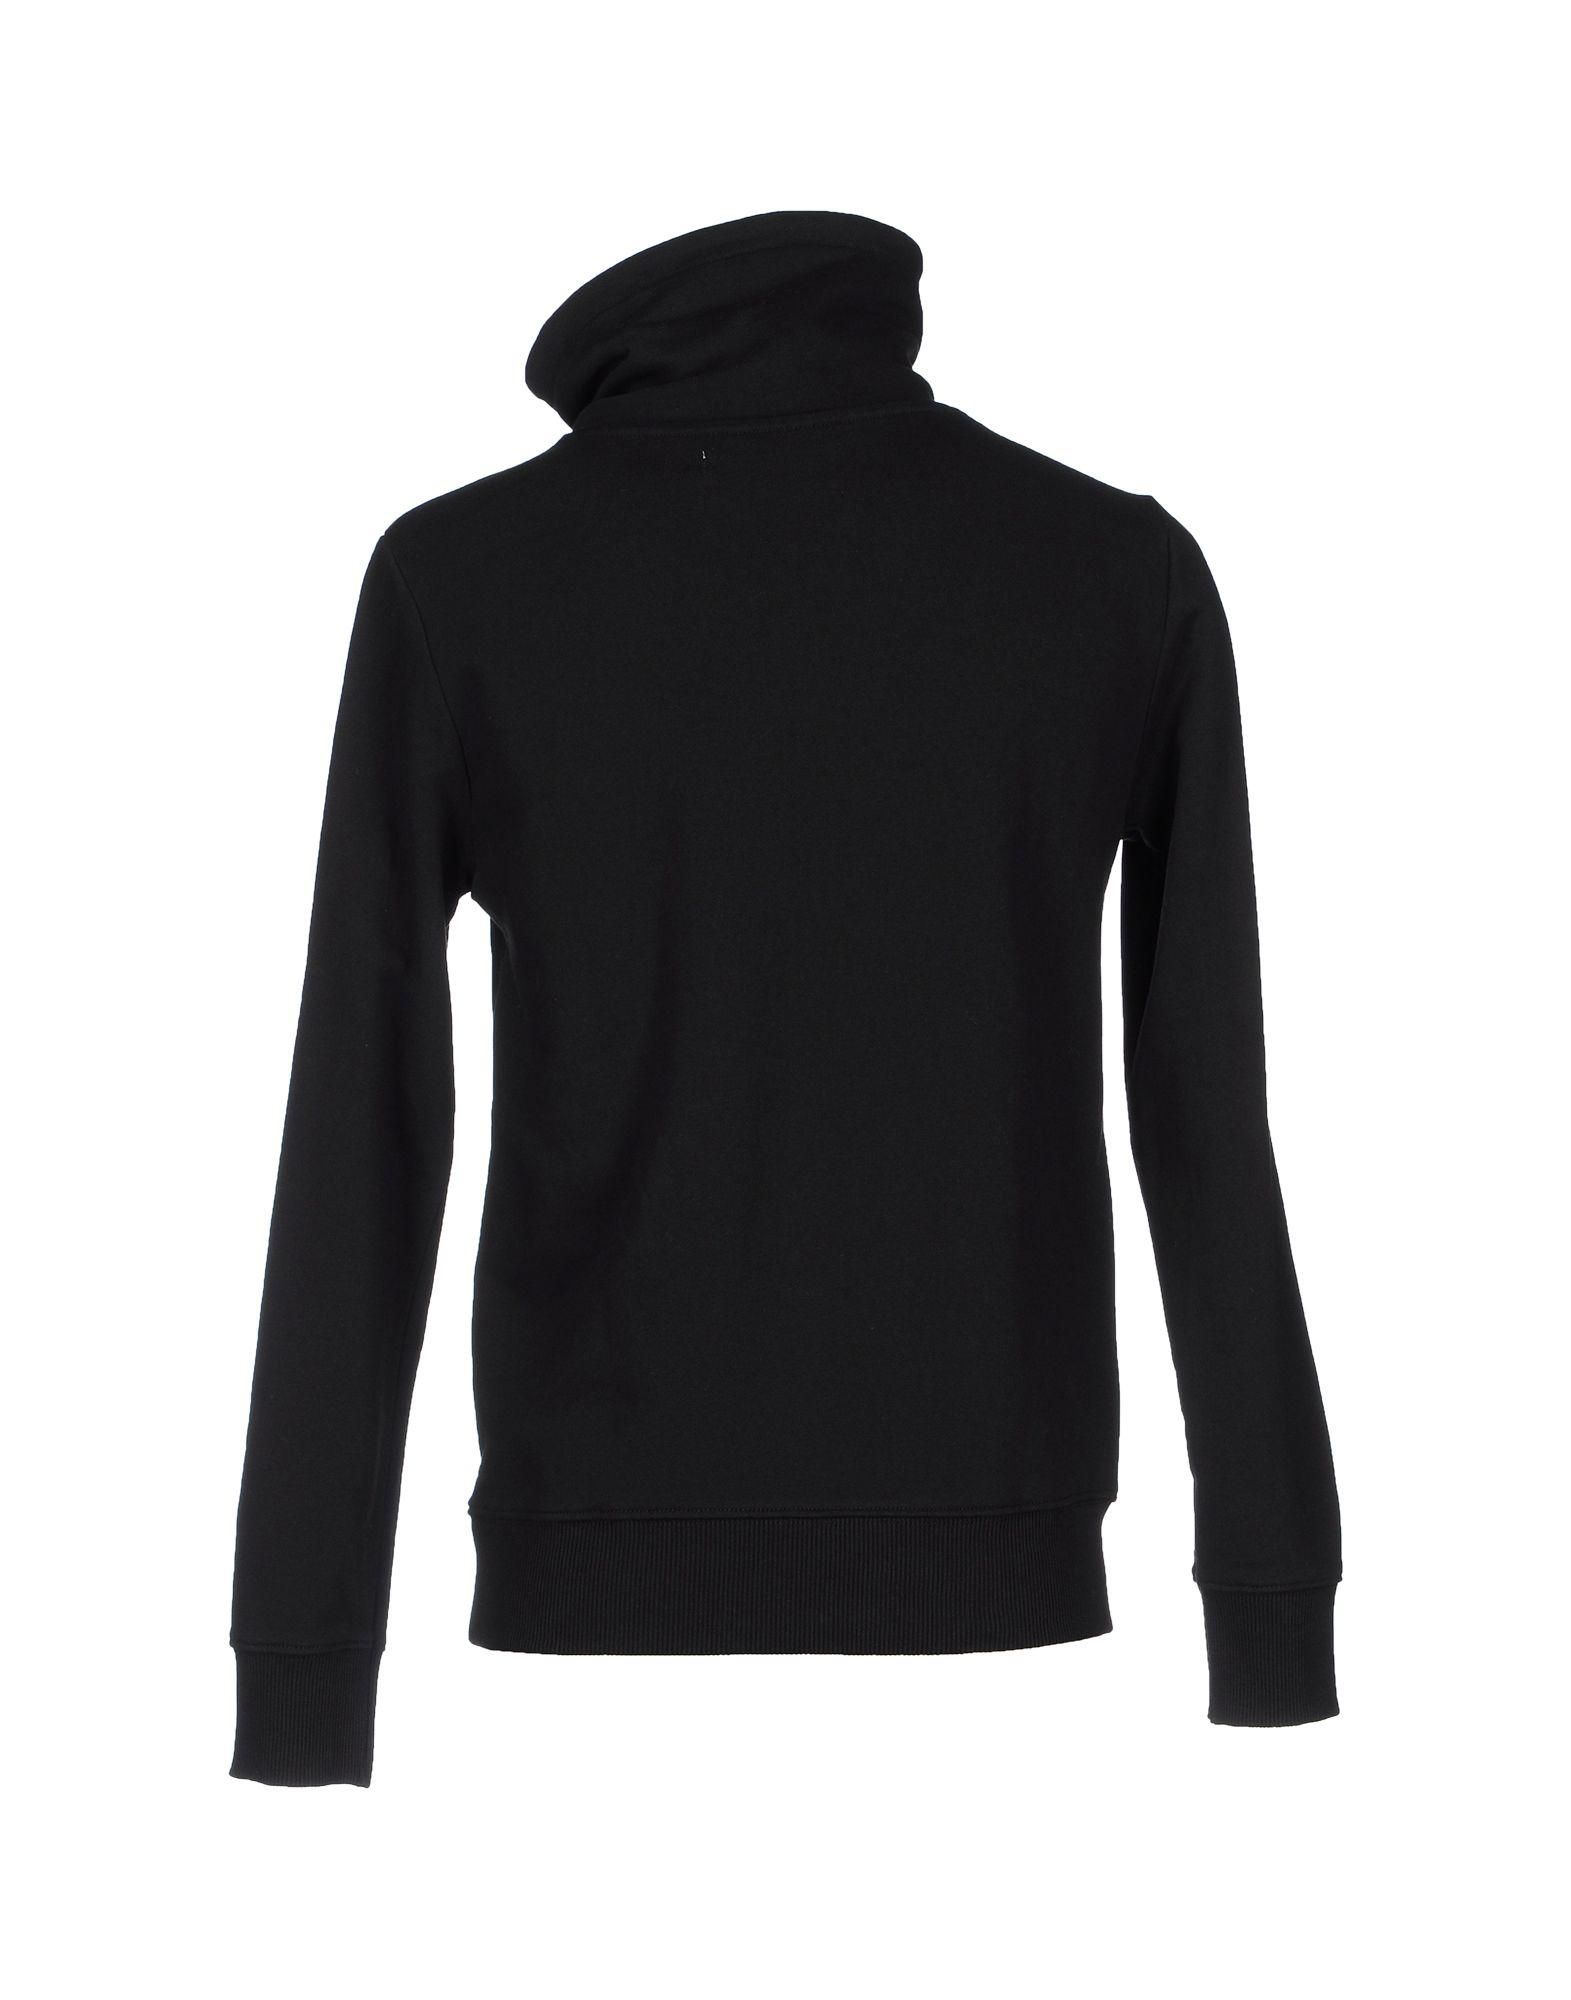 calvin klein jeans sweatshirt in black for men lyst. Black Bedroom Furniture Sets. Home Design Ideas